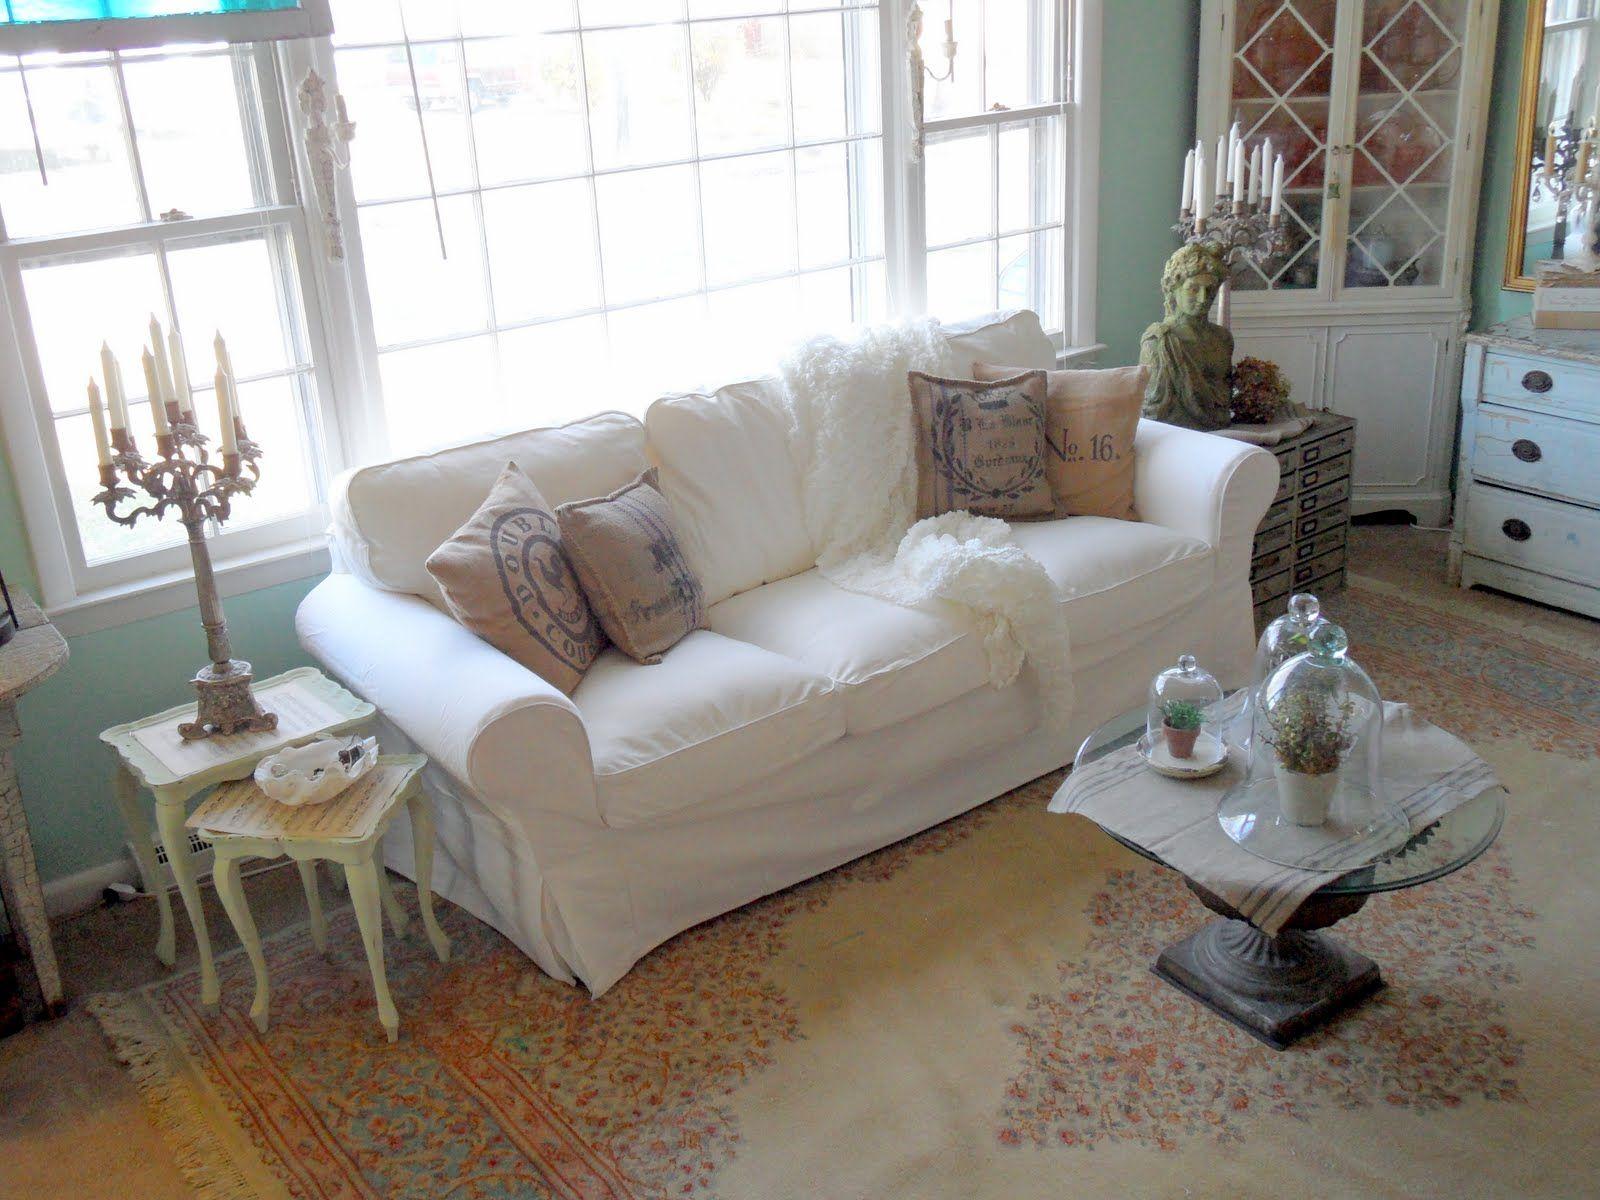 IKEA Ektorp blekinge white sofa Google Search